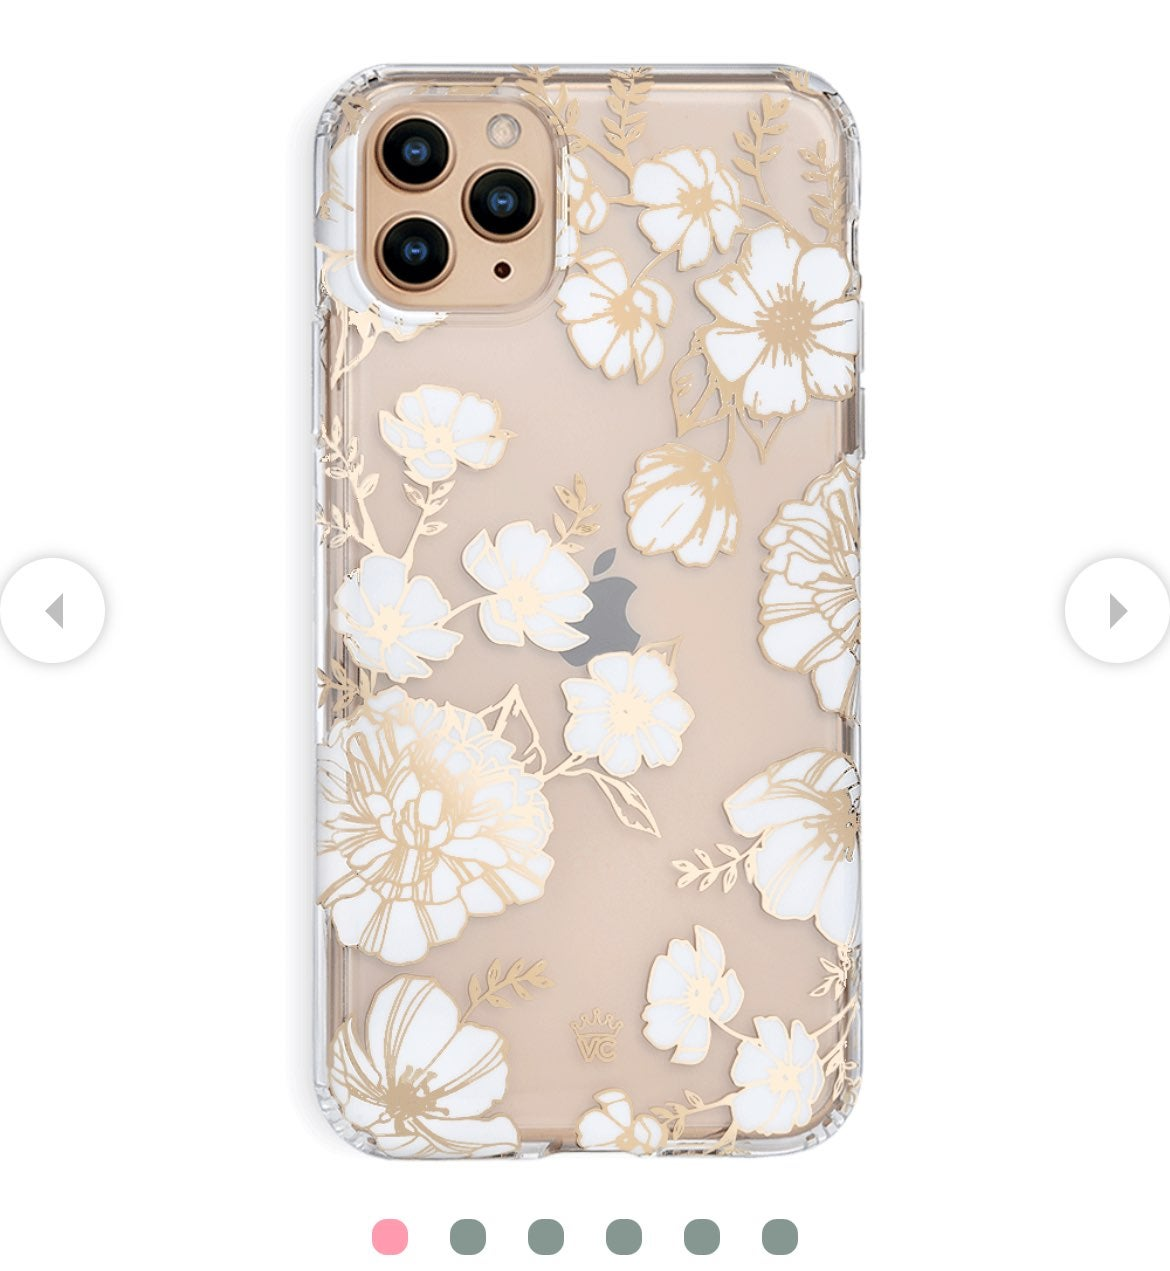 New Velvet Caviar IPhone 11 pro max case